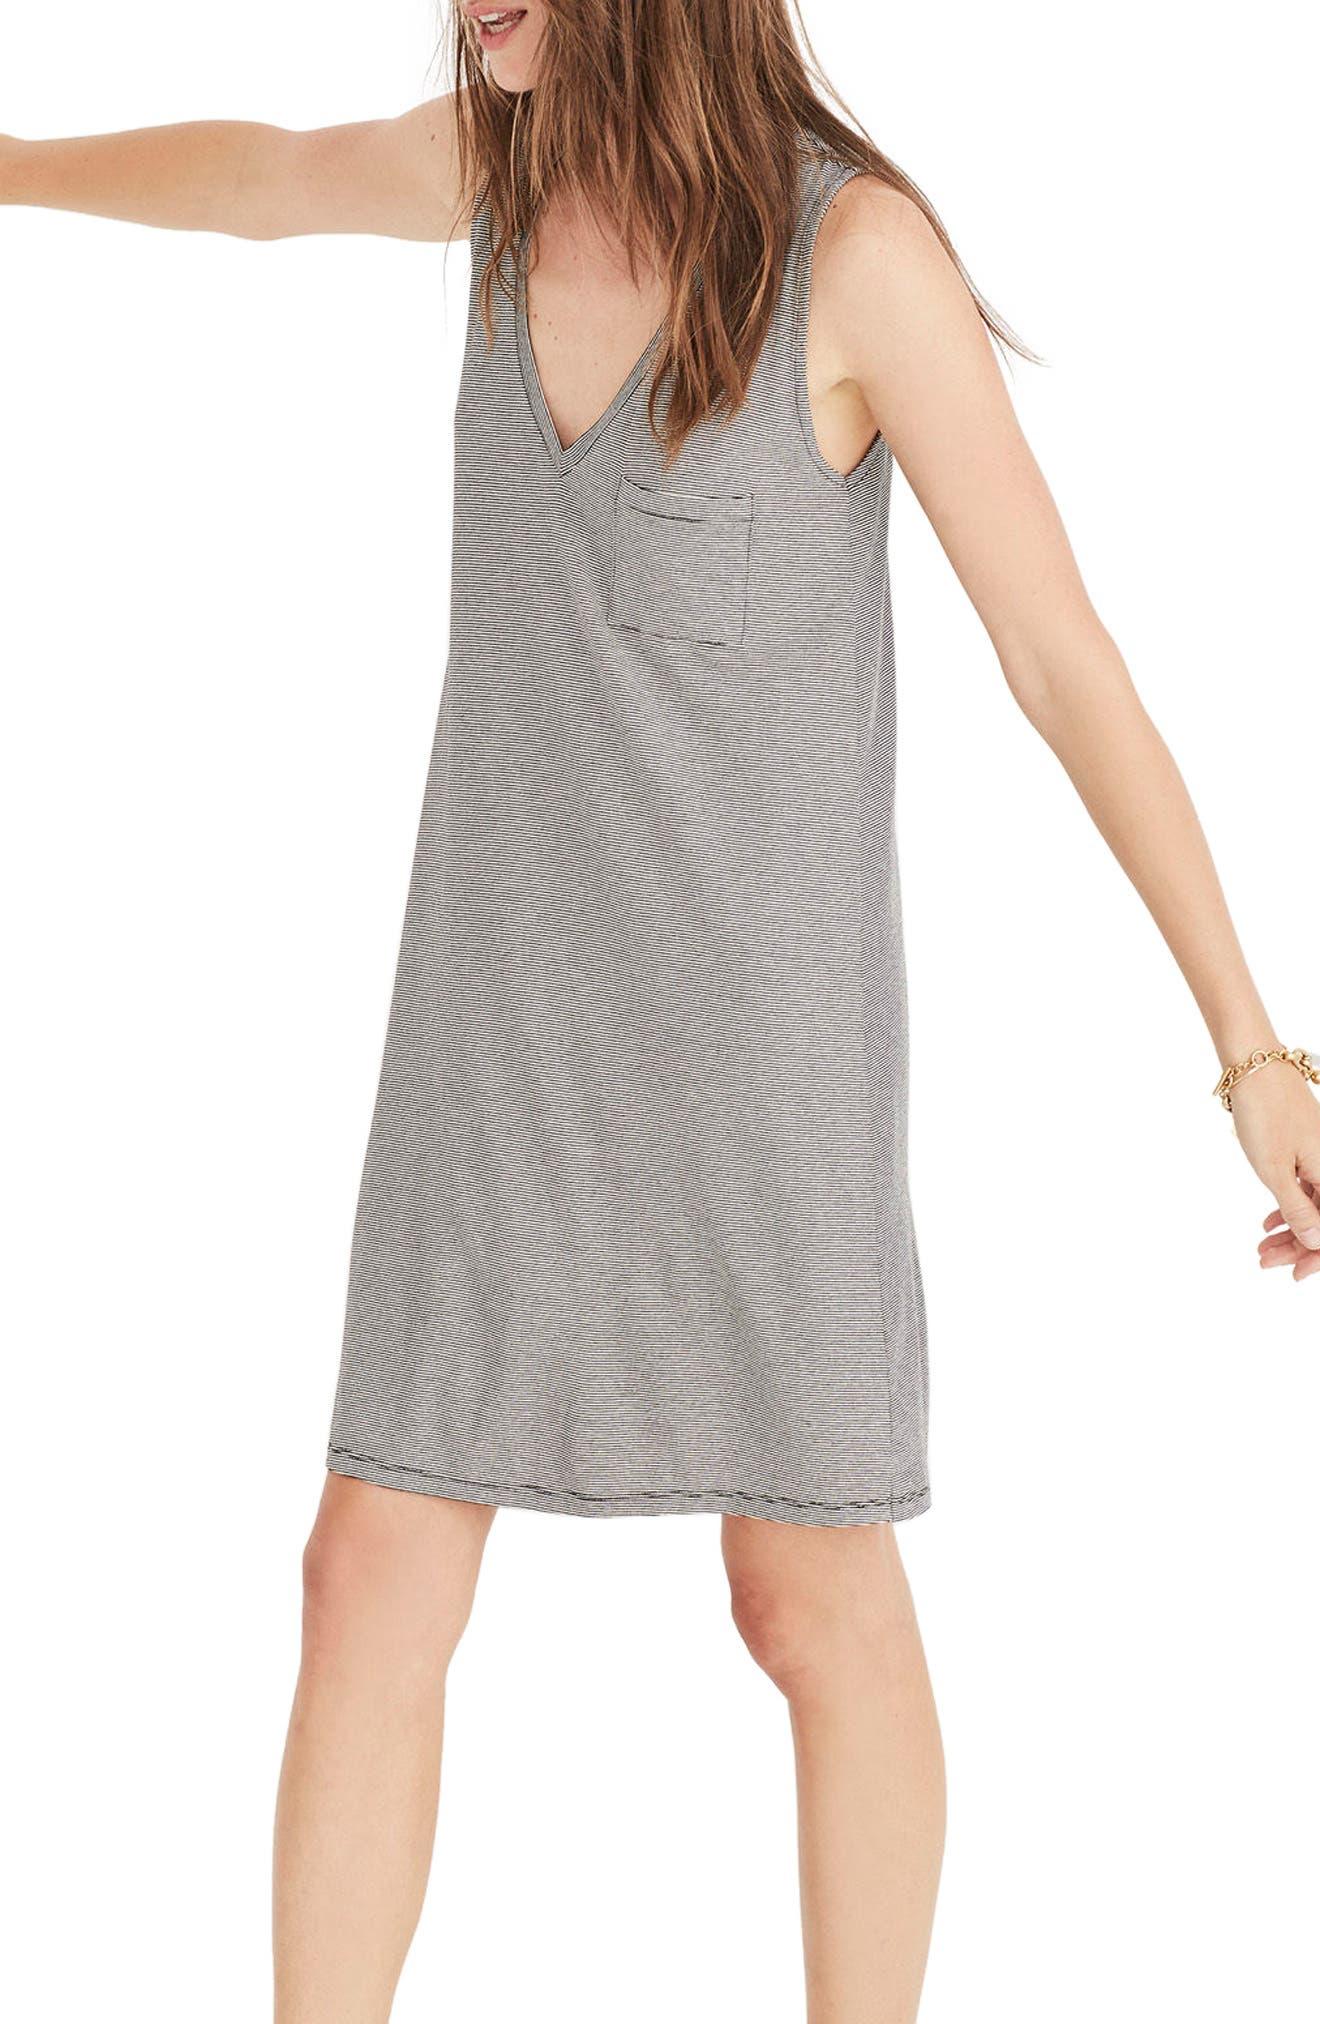 Alternate Image 1 Selected - Madewell Stripe Swingy Tank Dress